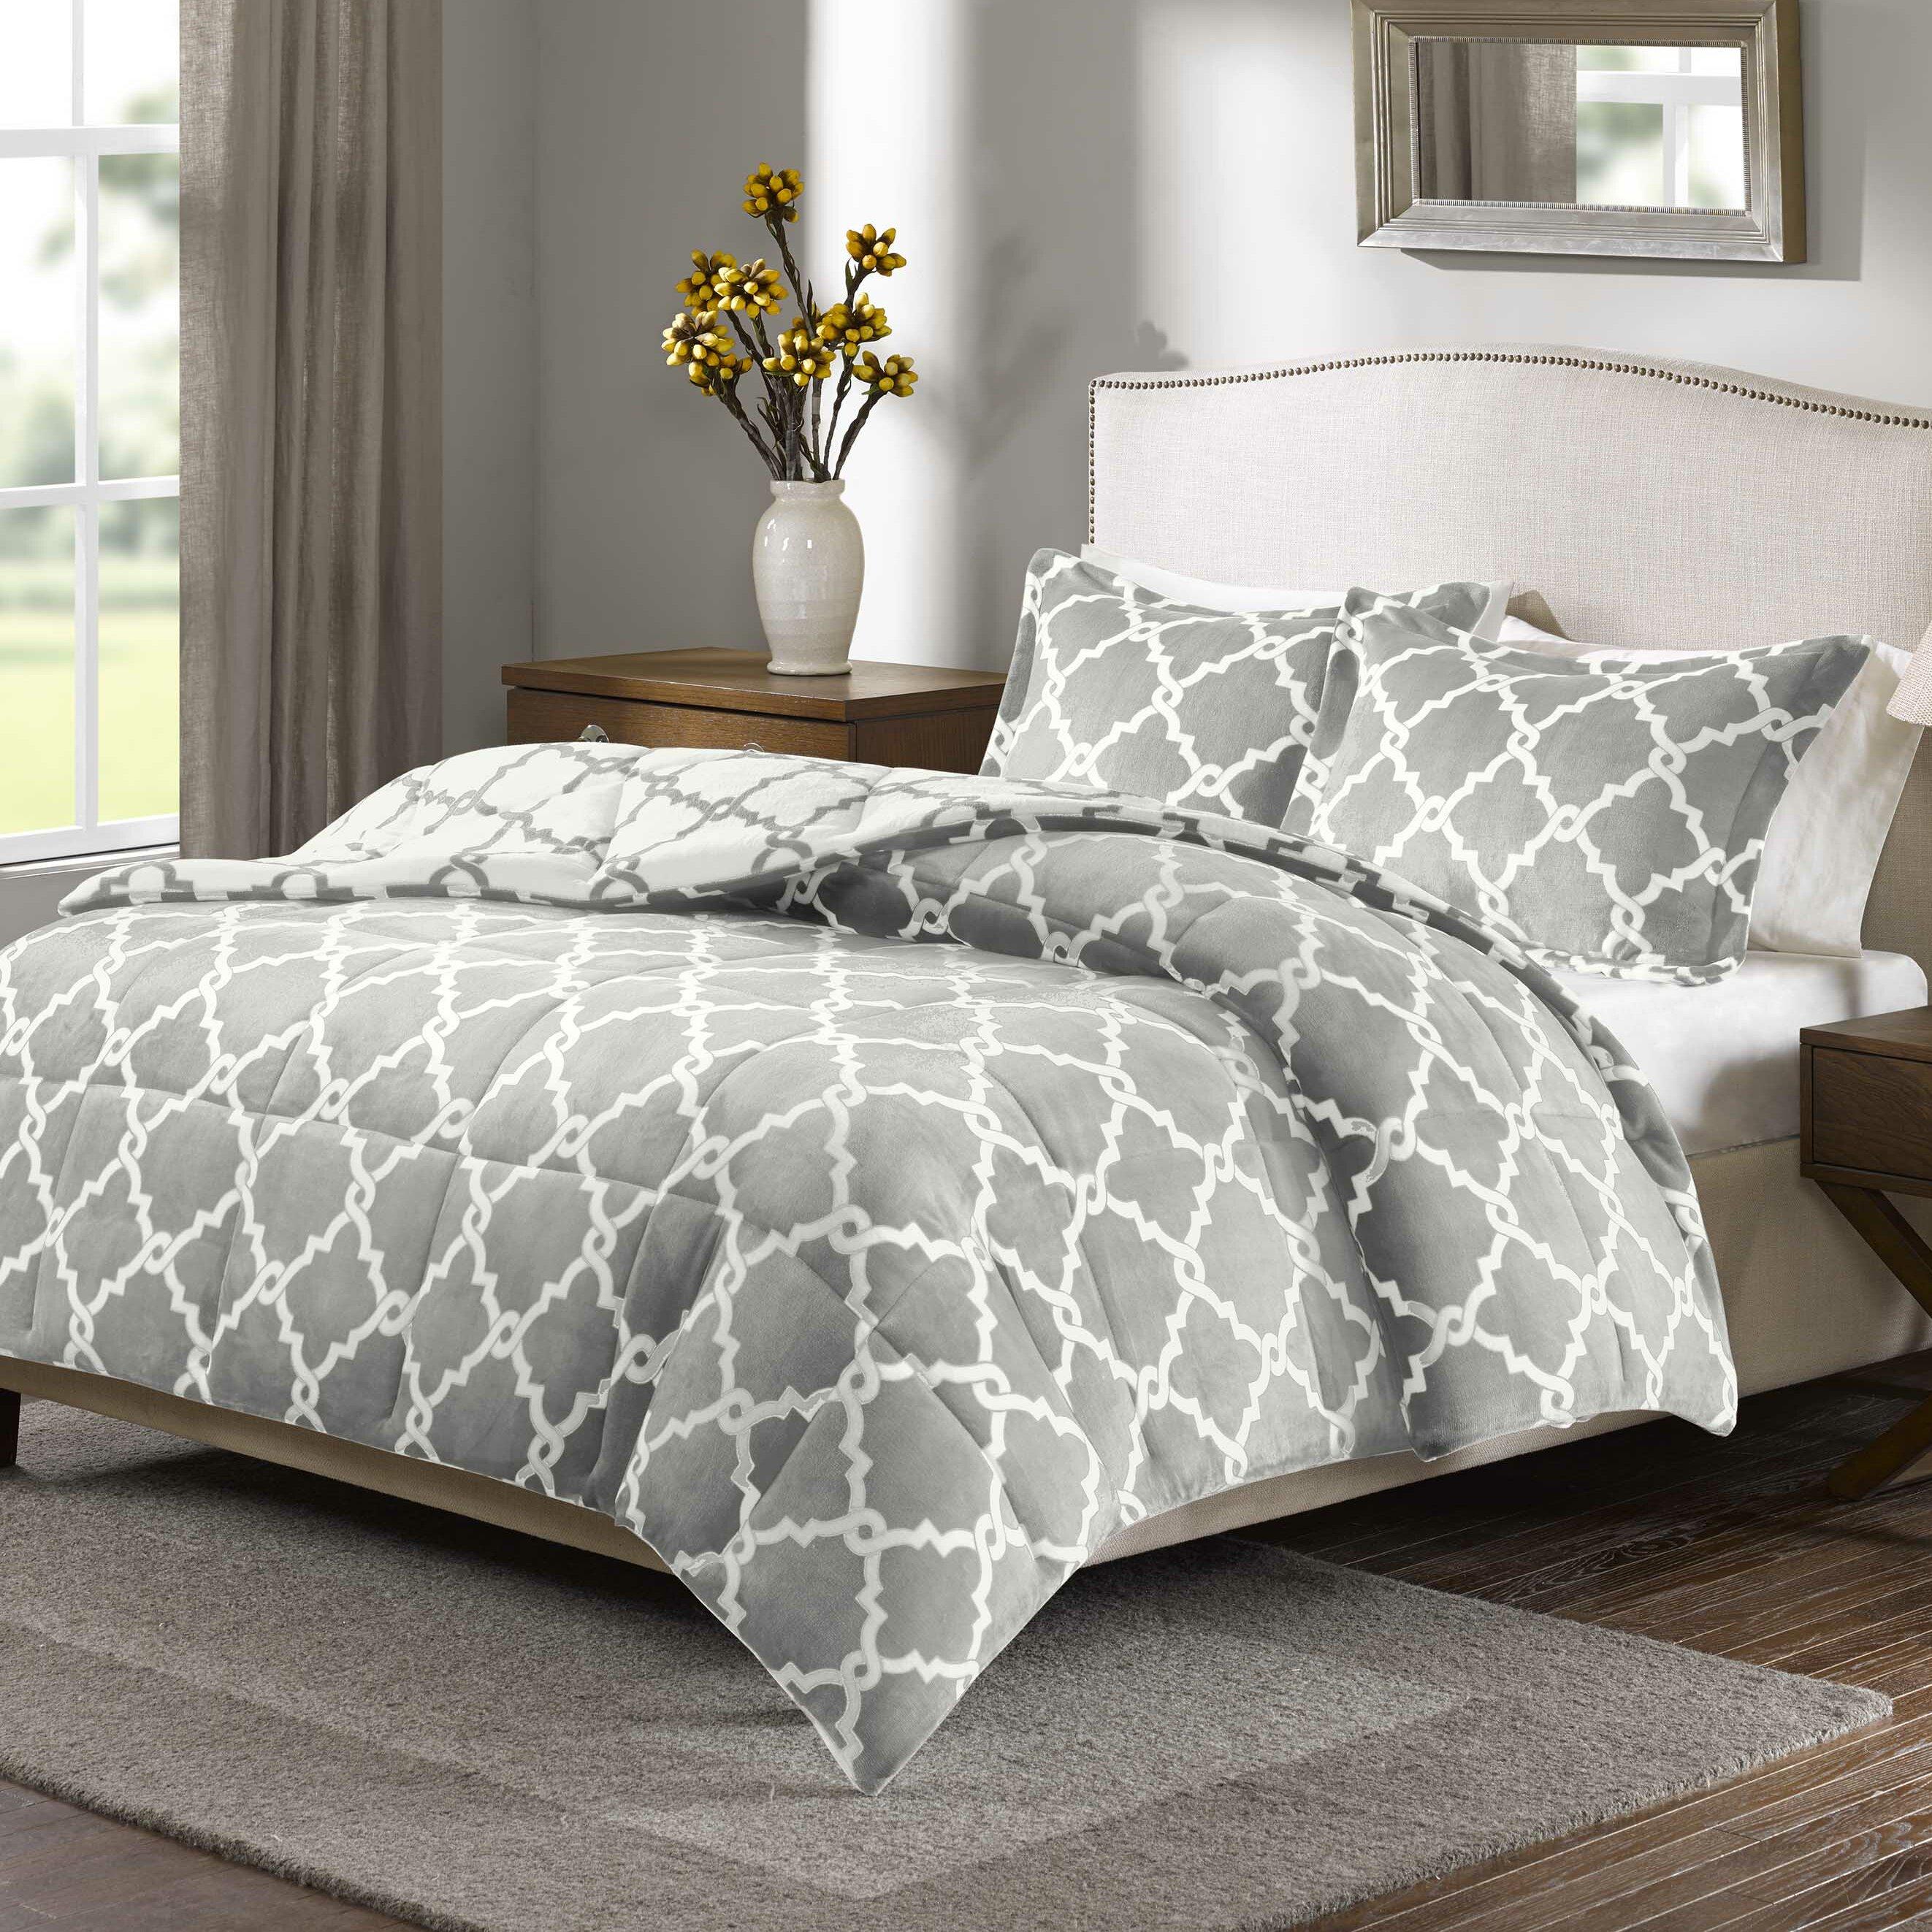 set comforter collectibles spring magnifier hallmart queen bed euro bedding w shams buy flower raw